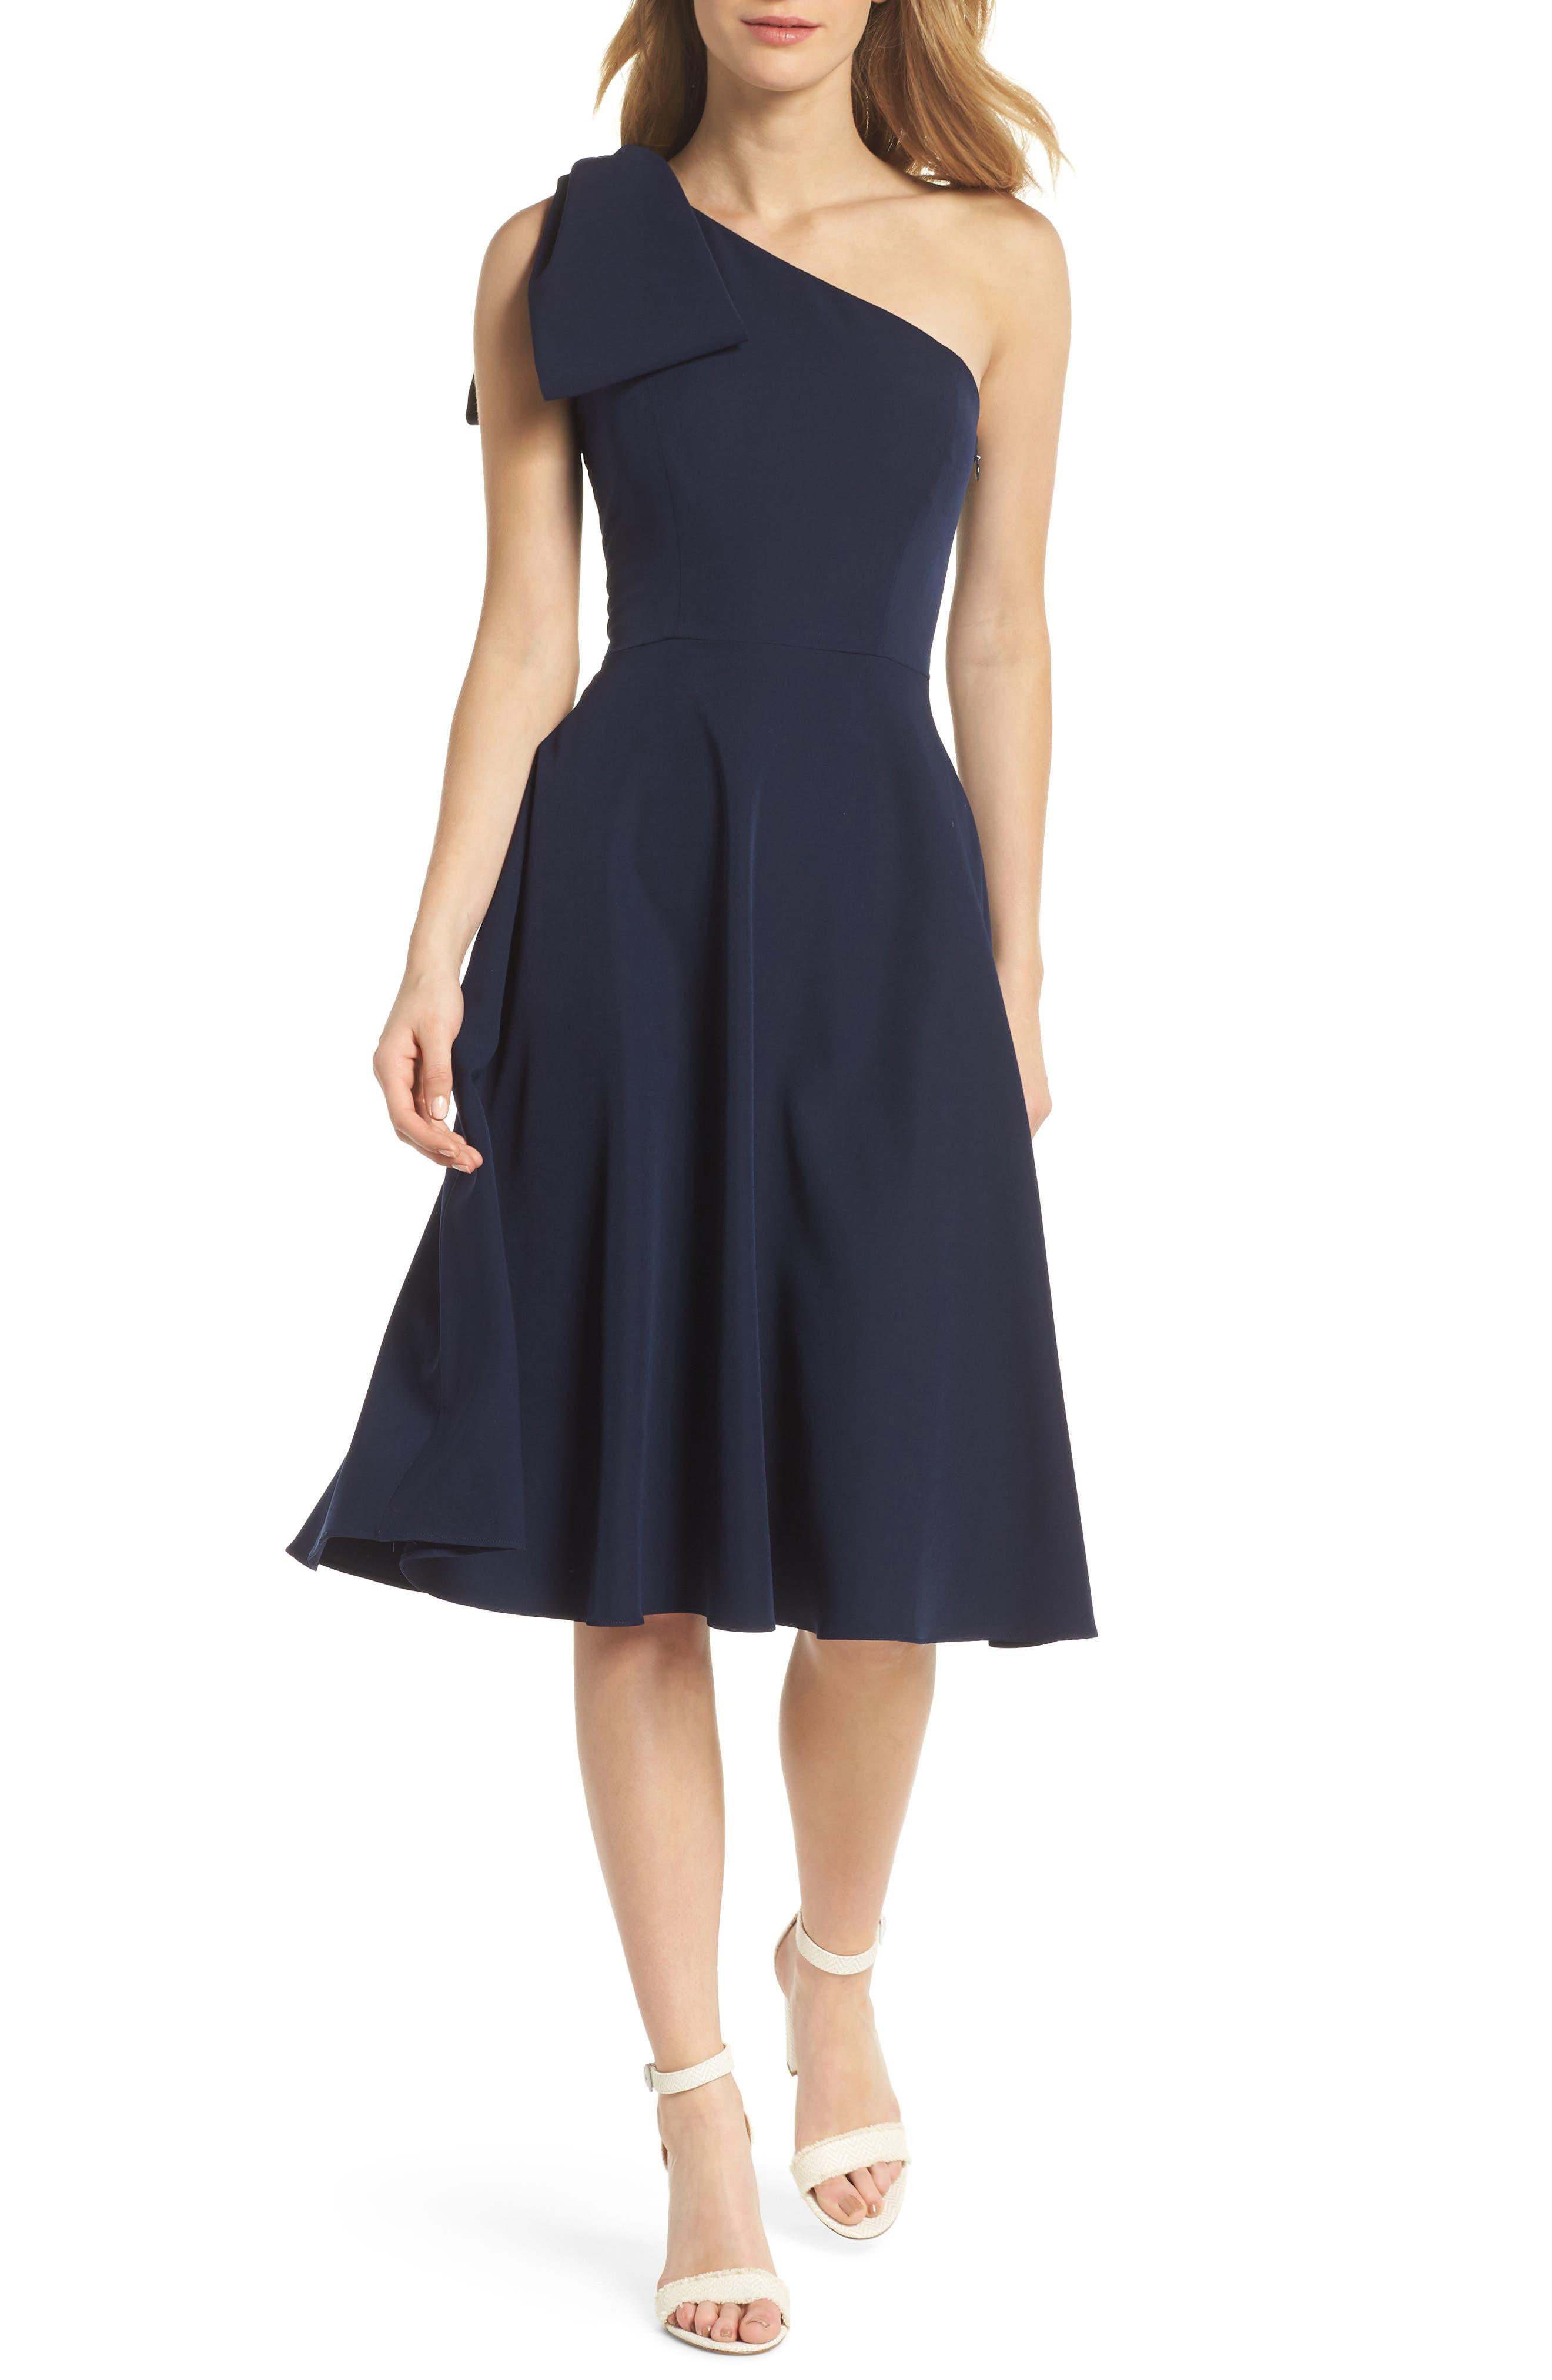 Yvonne Dream Crepe One-Shoulder Dress,                             Main thumbnail 1, color,                             Navy